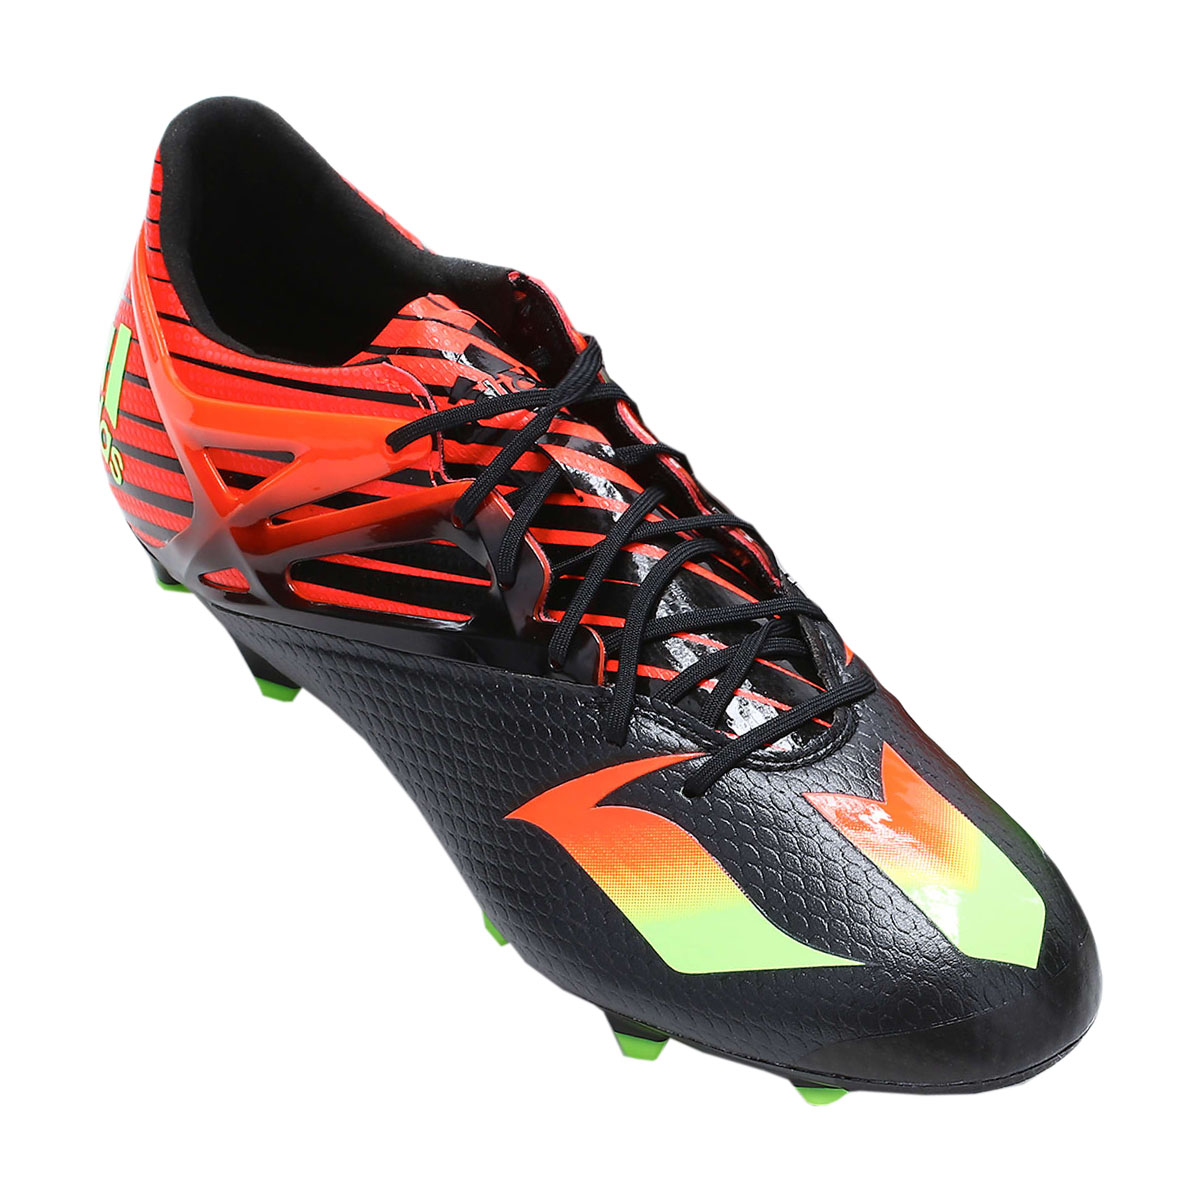 NEU adidas caballeros Messi 15.1 FG AG caballeros adidas FussballZapatos  AF4654 SALE bdd7aa